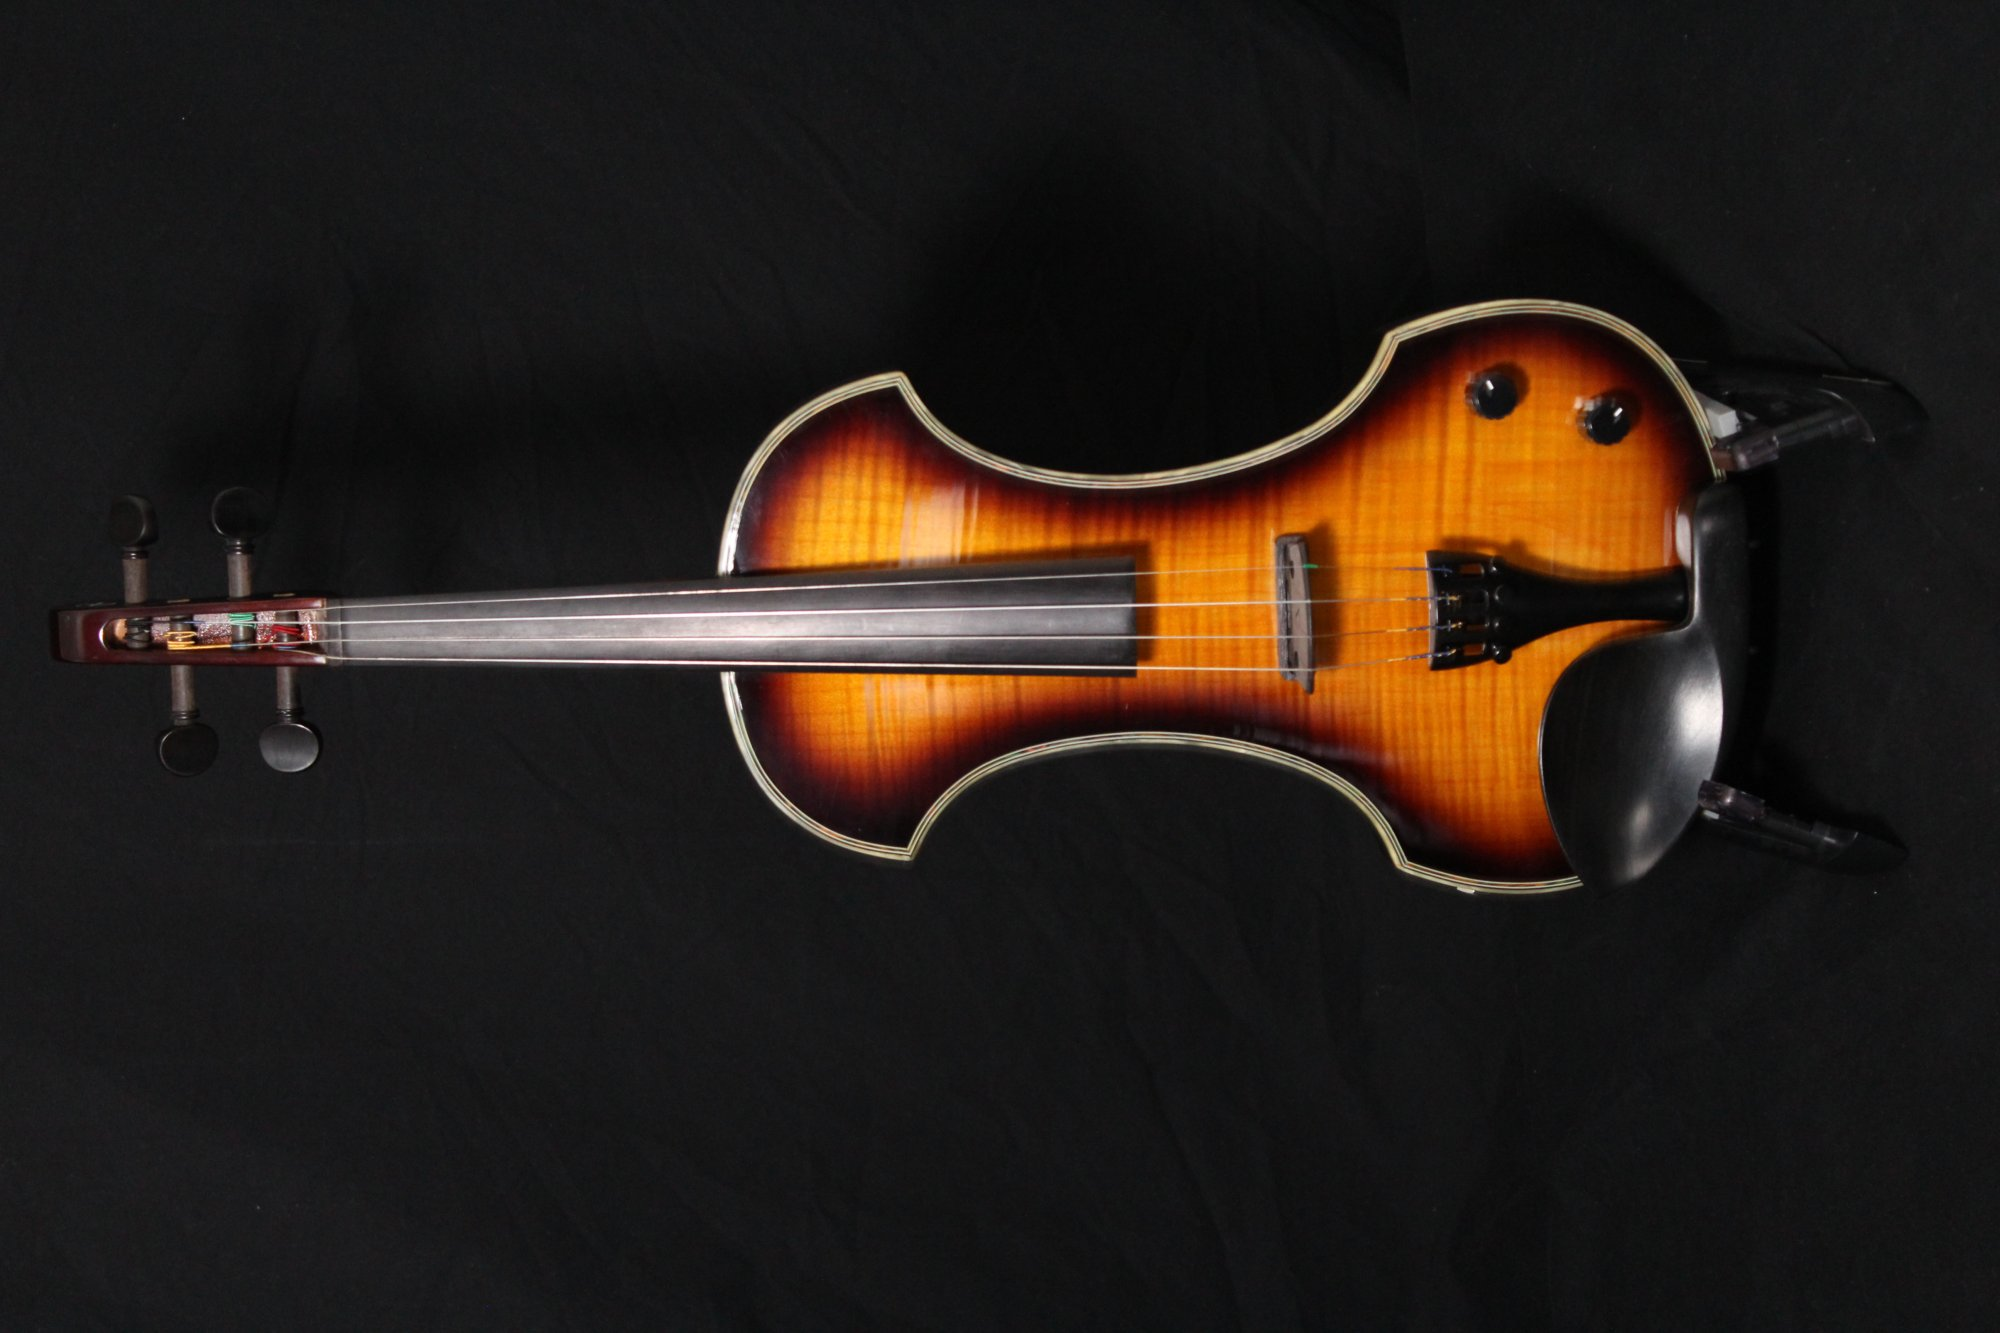 Preowned Fender Electric Violin FV-3 DLX SB w/ Case